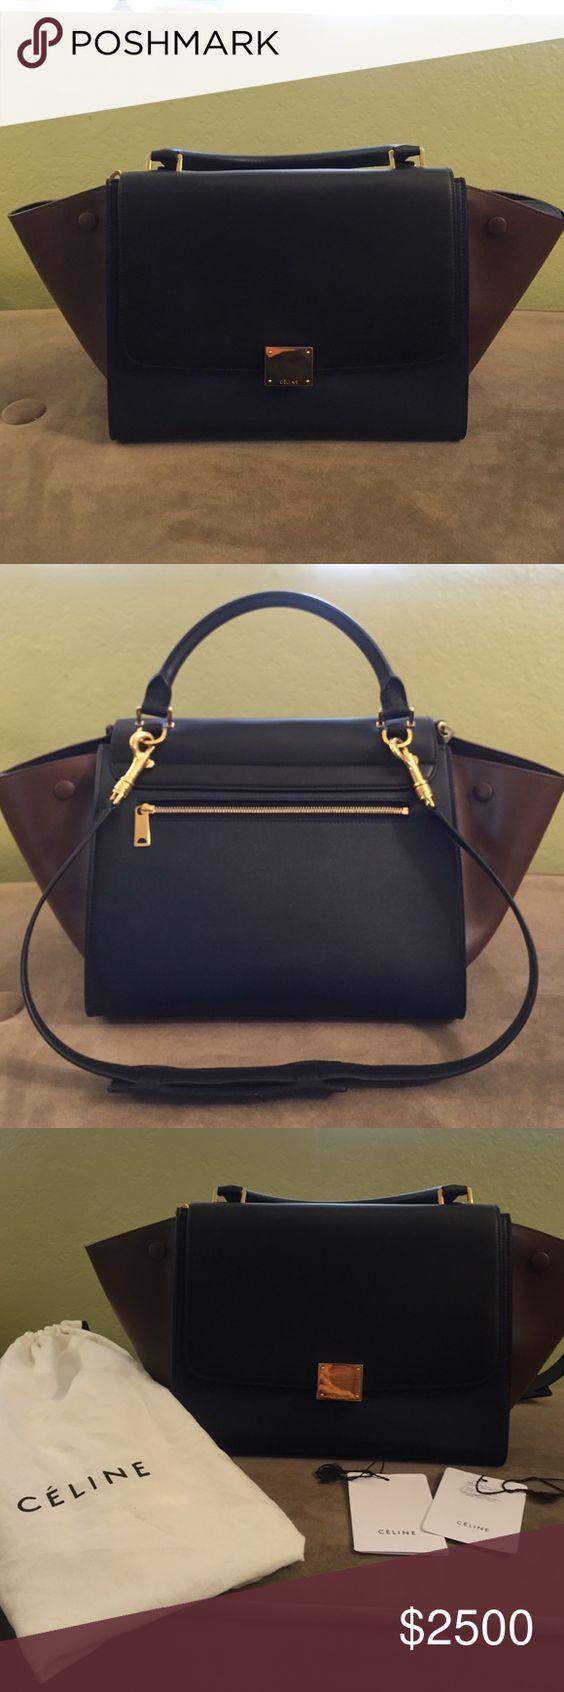 shop celine bags - celine medium tricolor trapeze bag, celine pink bag price